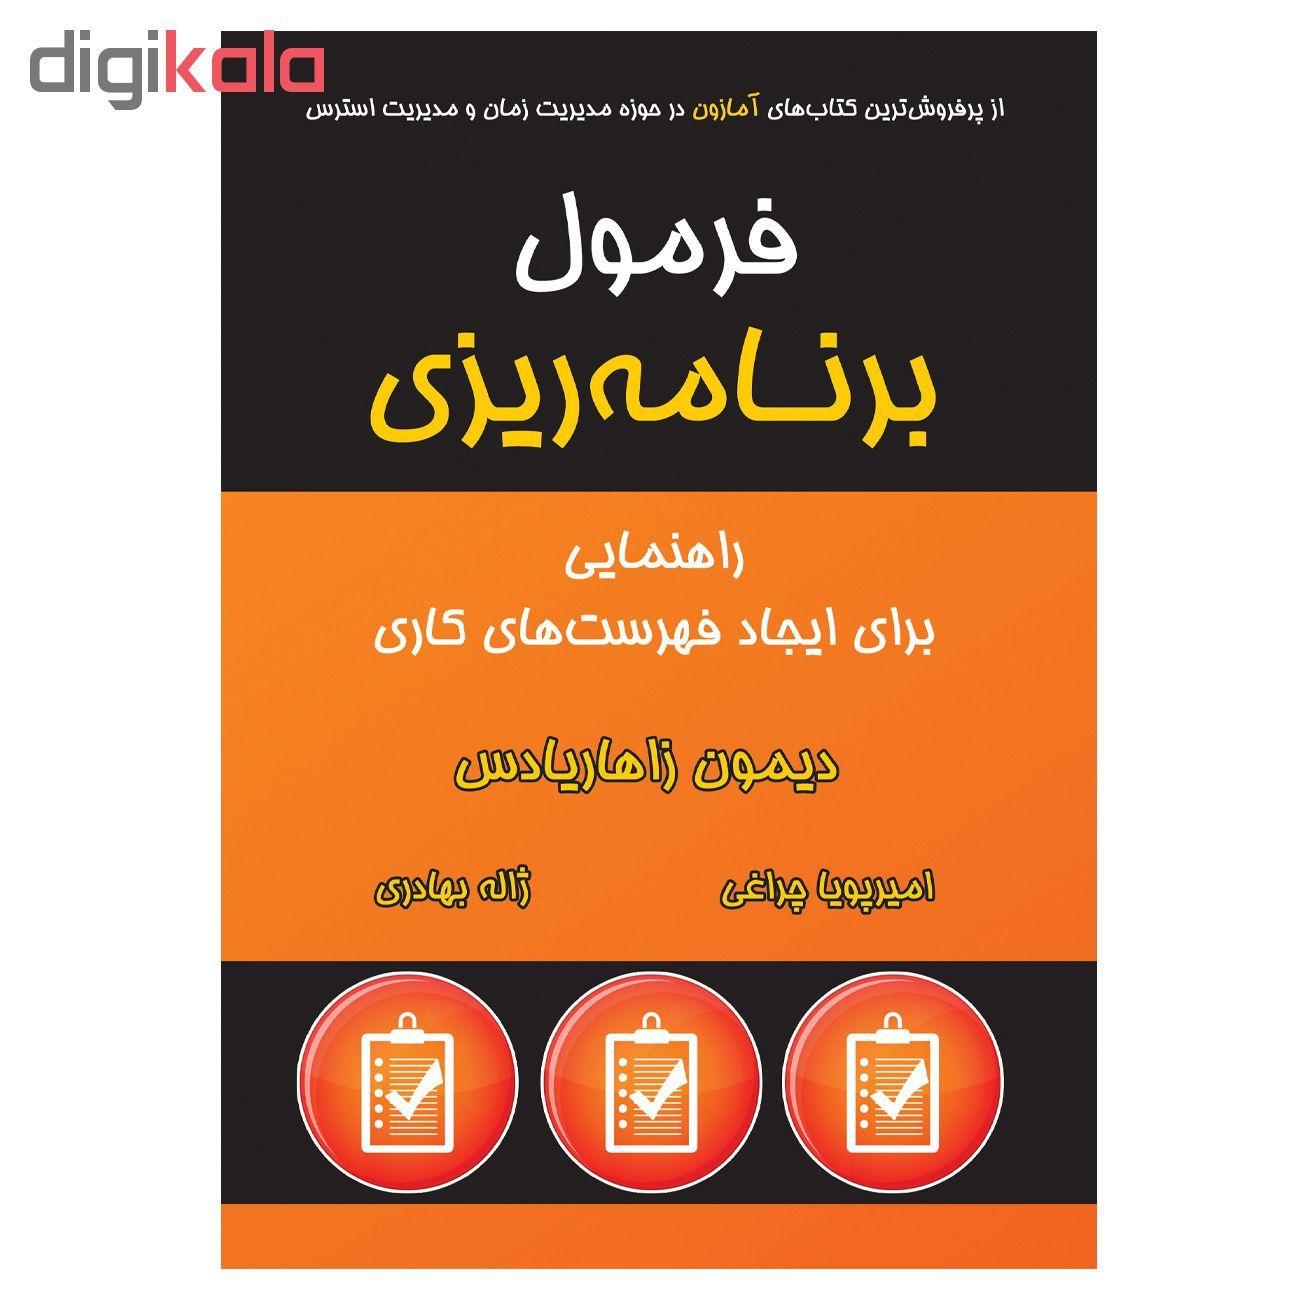 کتاب فرمول برنامه ریزی اثر دیمون زاهاریادس نشر نوین main 1 1